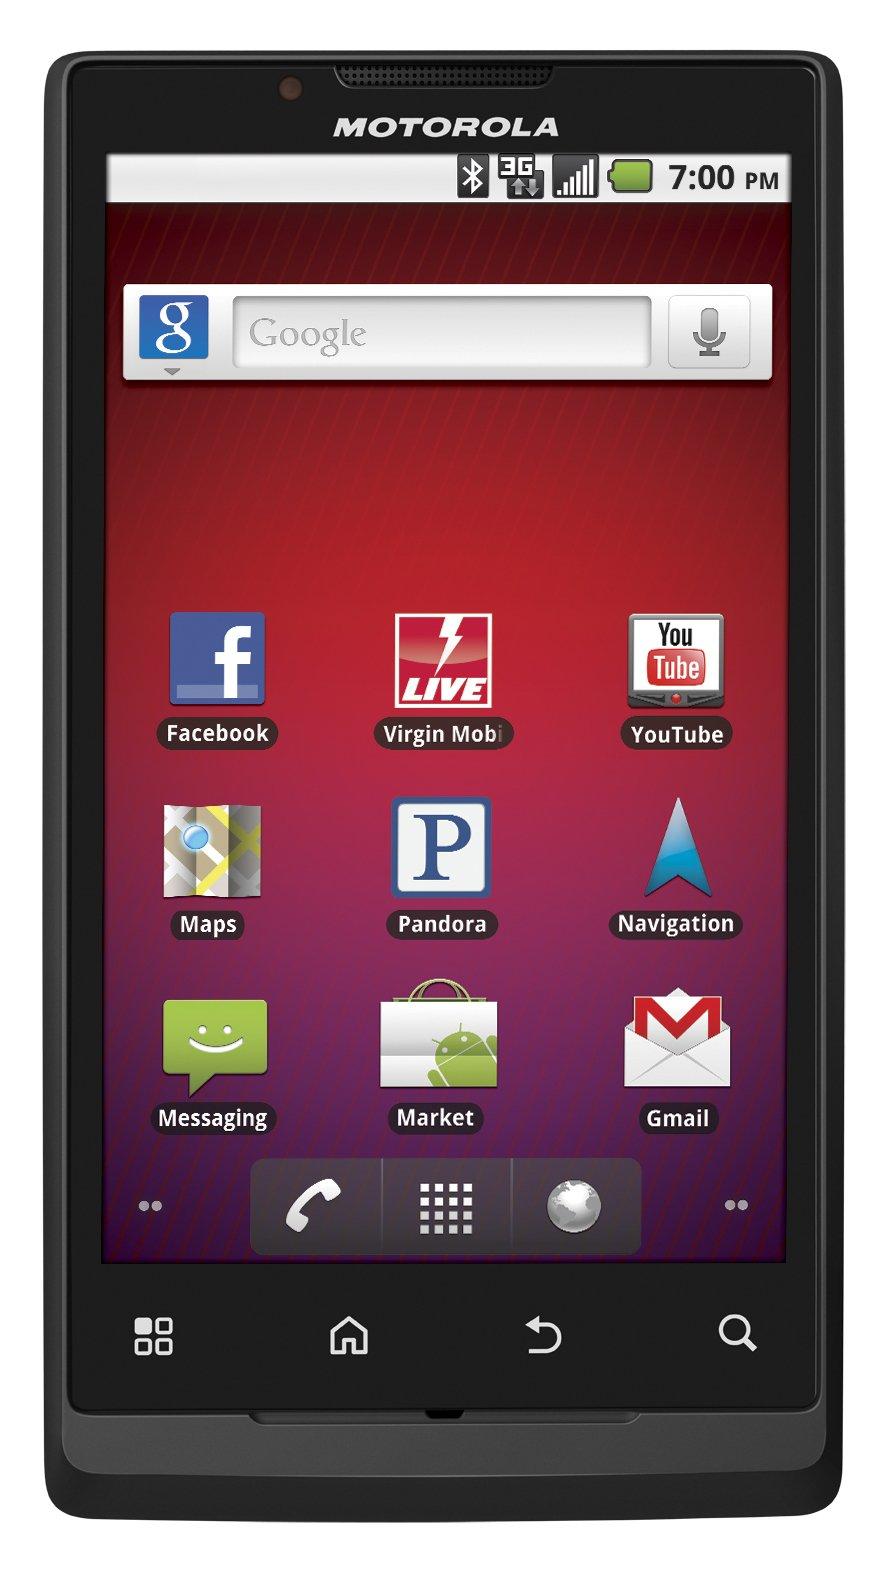 Motorola Triumph Prepaid Android Phone (Virgin Mobile)